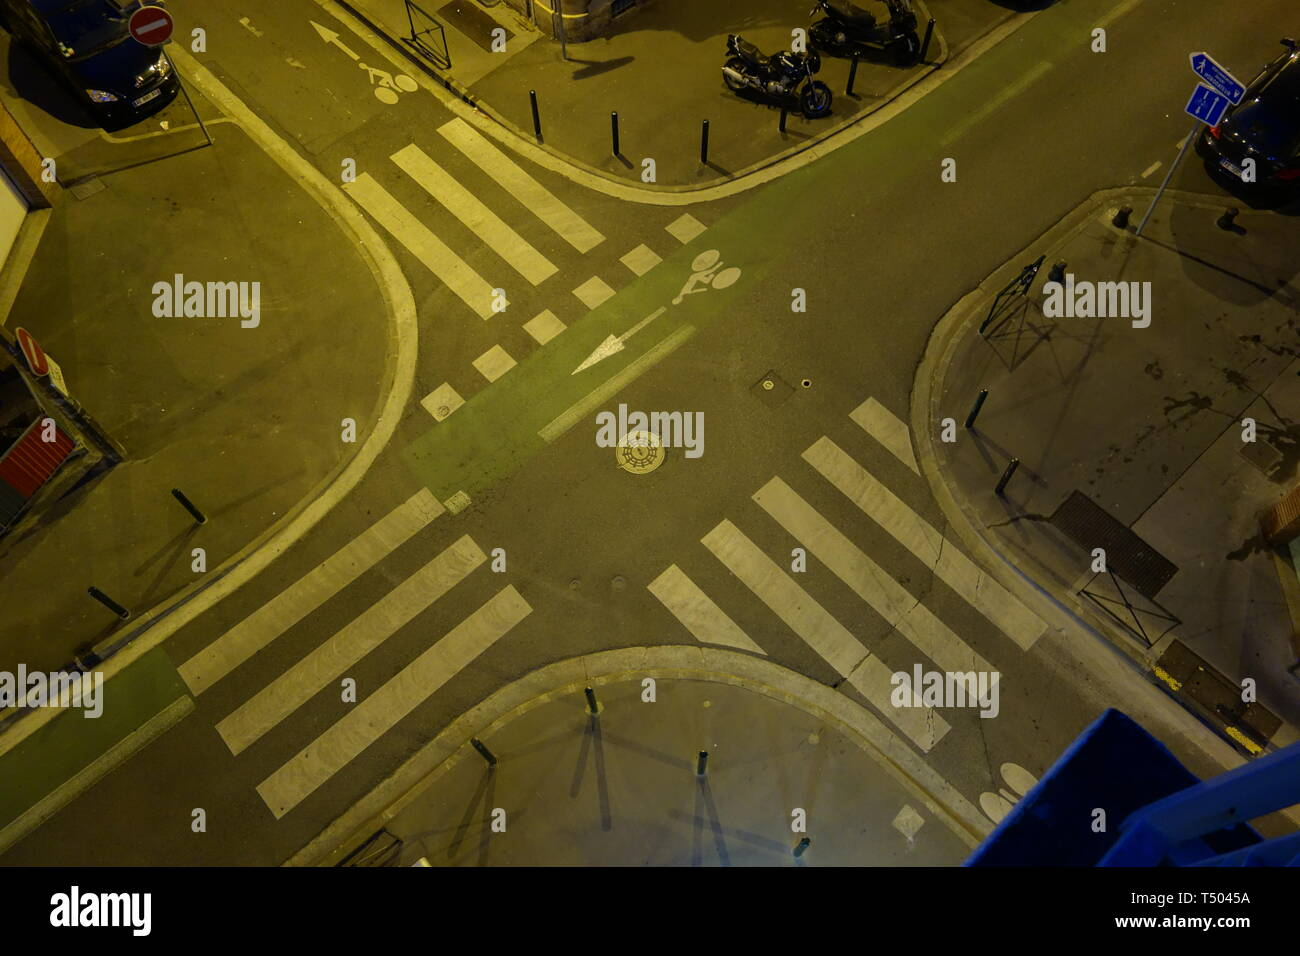 Toulouse, Straßenkreuzung mit Radstreifen - Stock Image